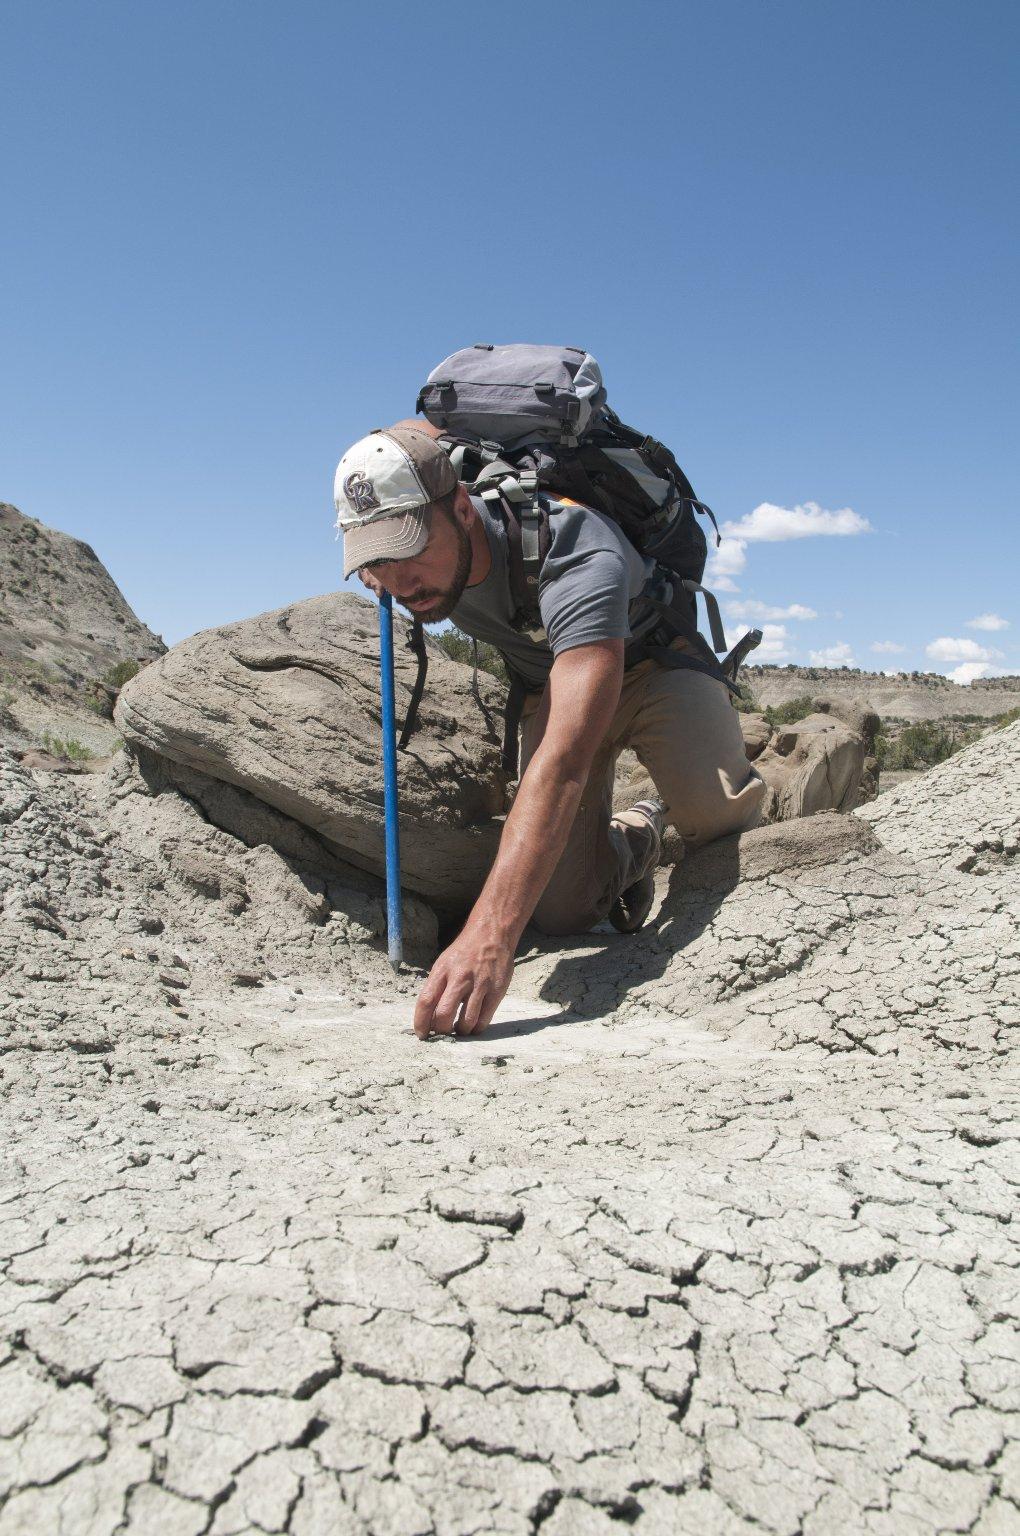 Dr. Joseph Sertich, DMNS Curator of Vertebrate Paleontology, closely examines a potential specimen.